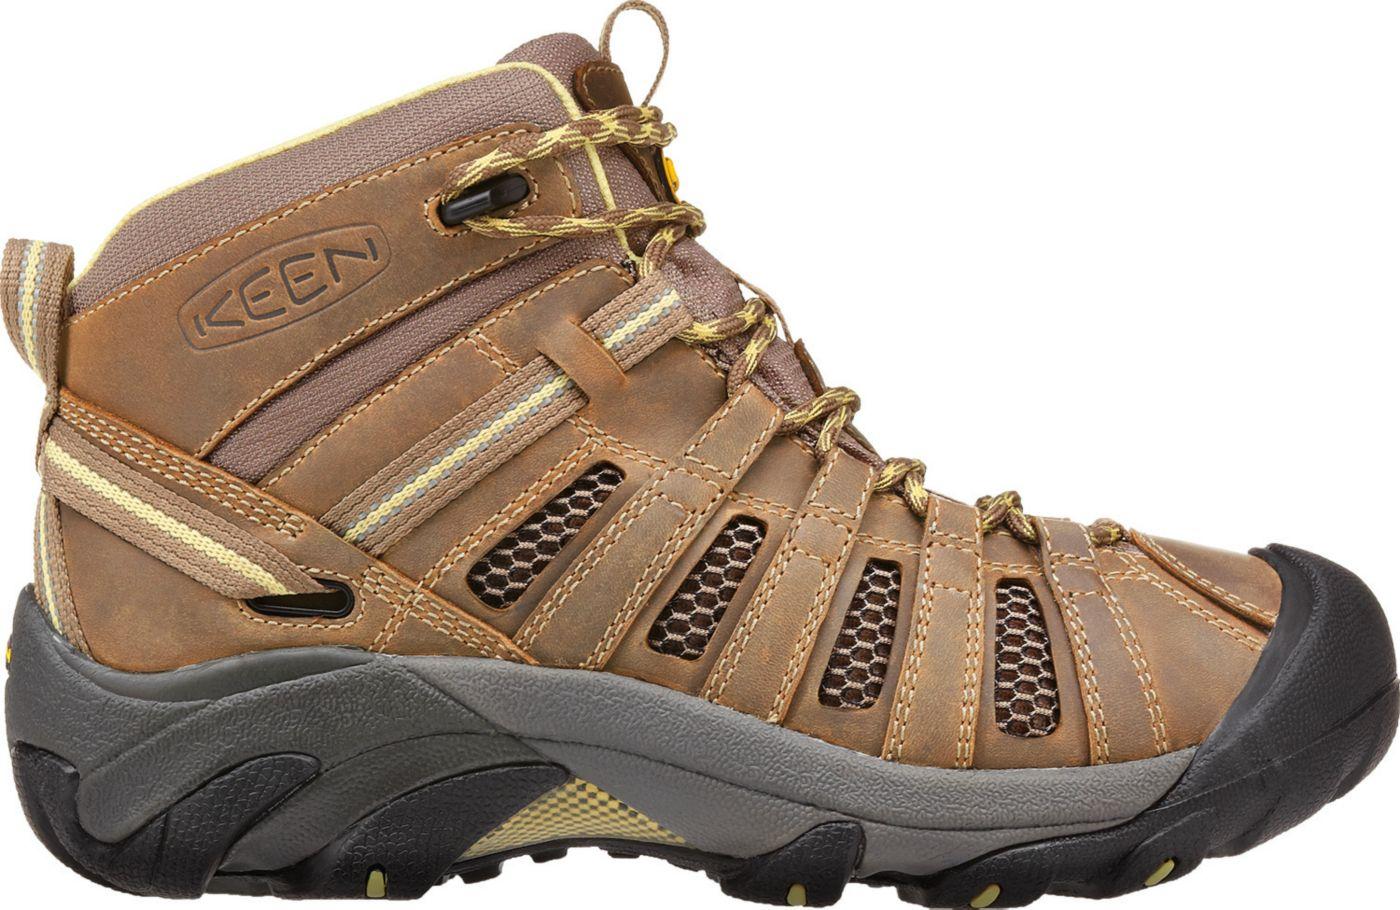 KEEN Women's Voyageur Mid Hiking Boots